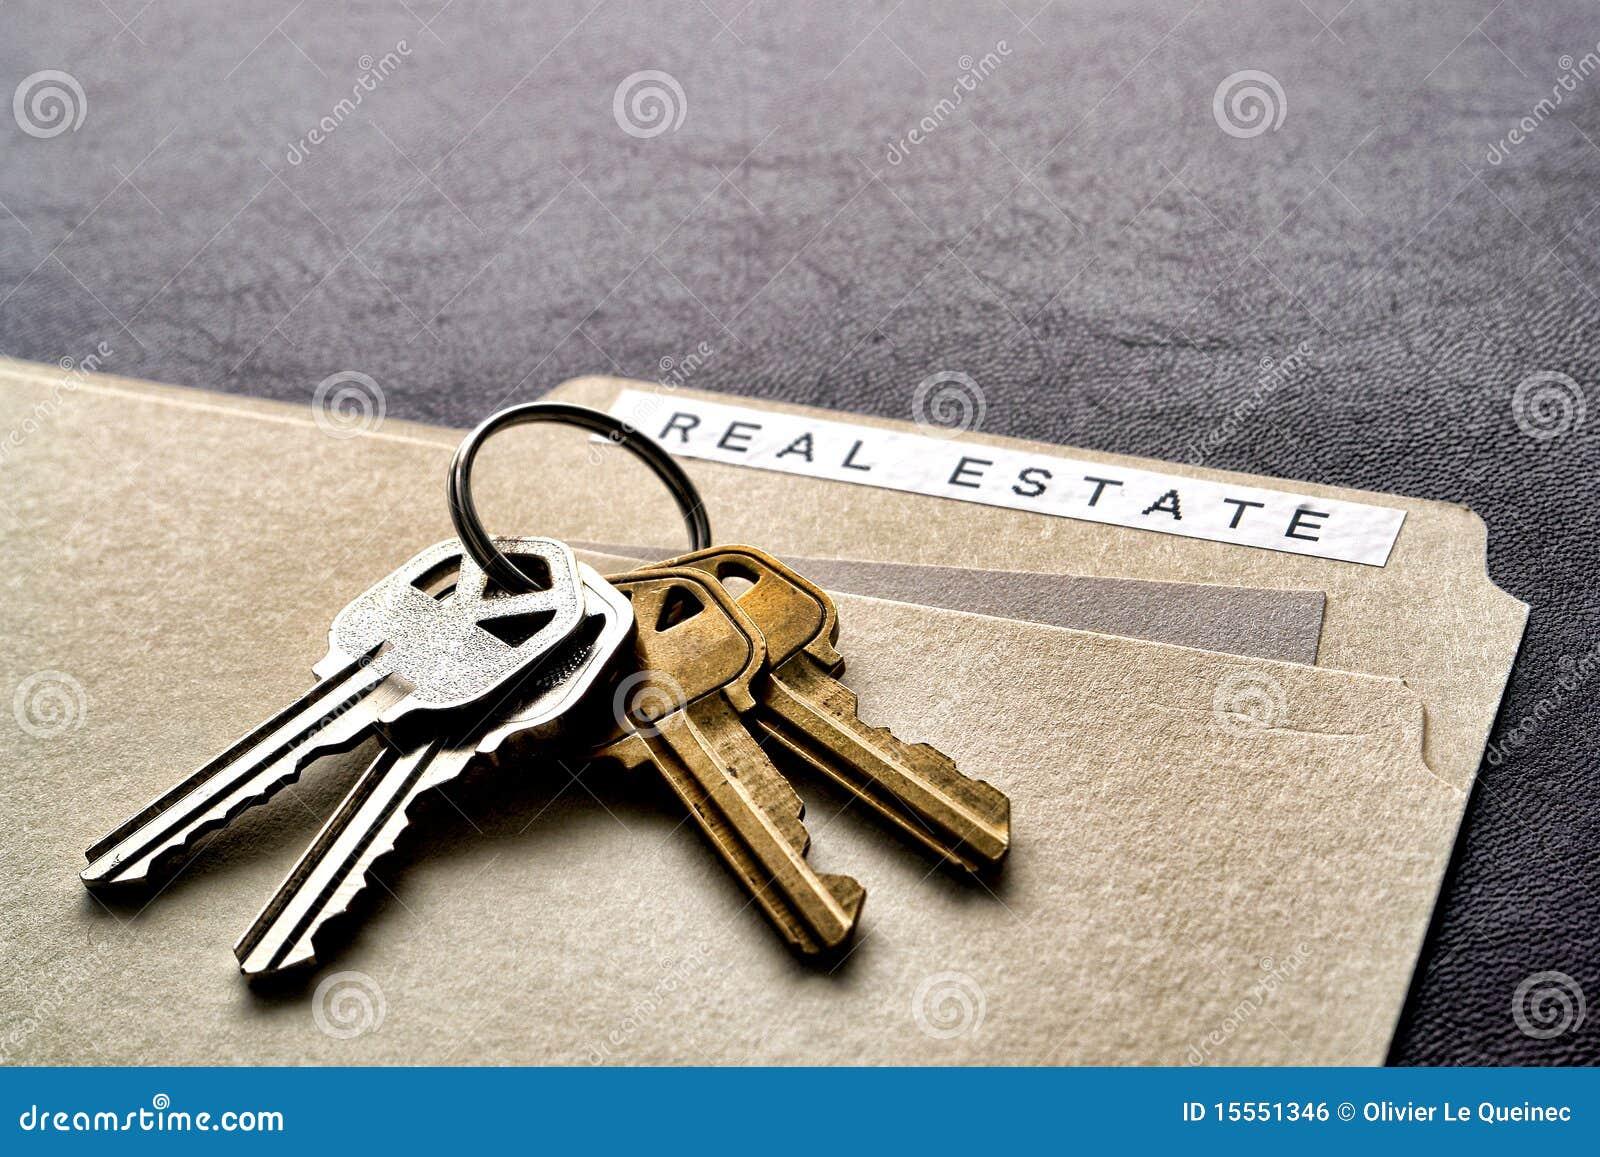 Real Estate Folder And Set Of House Keys On Desk Stock Photo